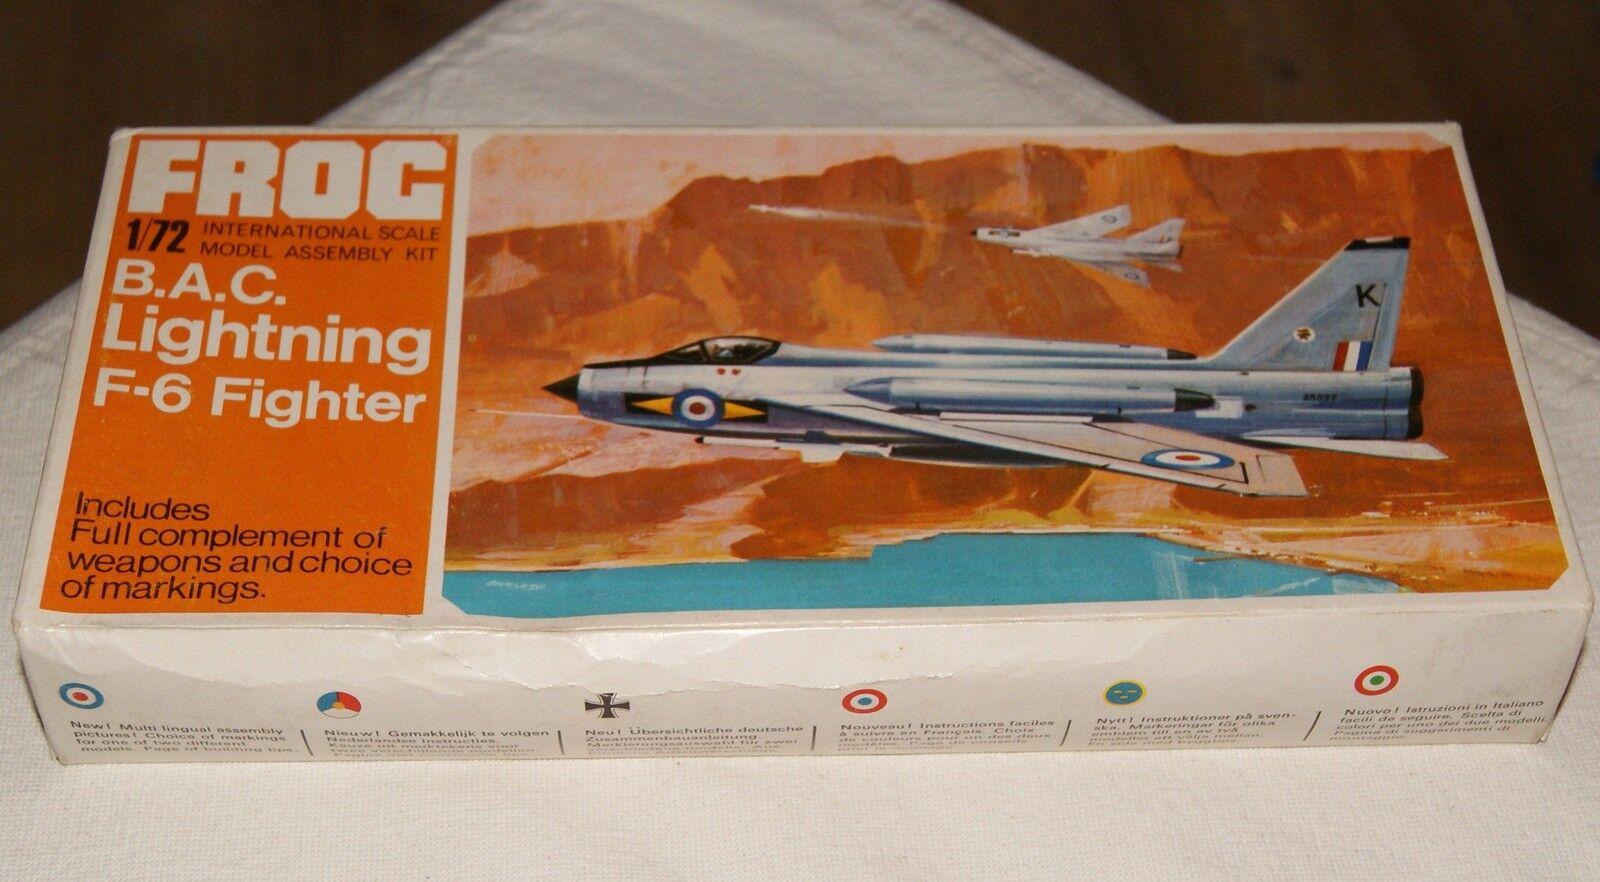 FROG Modell 1 72 B.A.C. Lightning F-6 Fighter VINTAGE 60s 70s